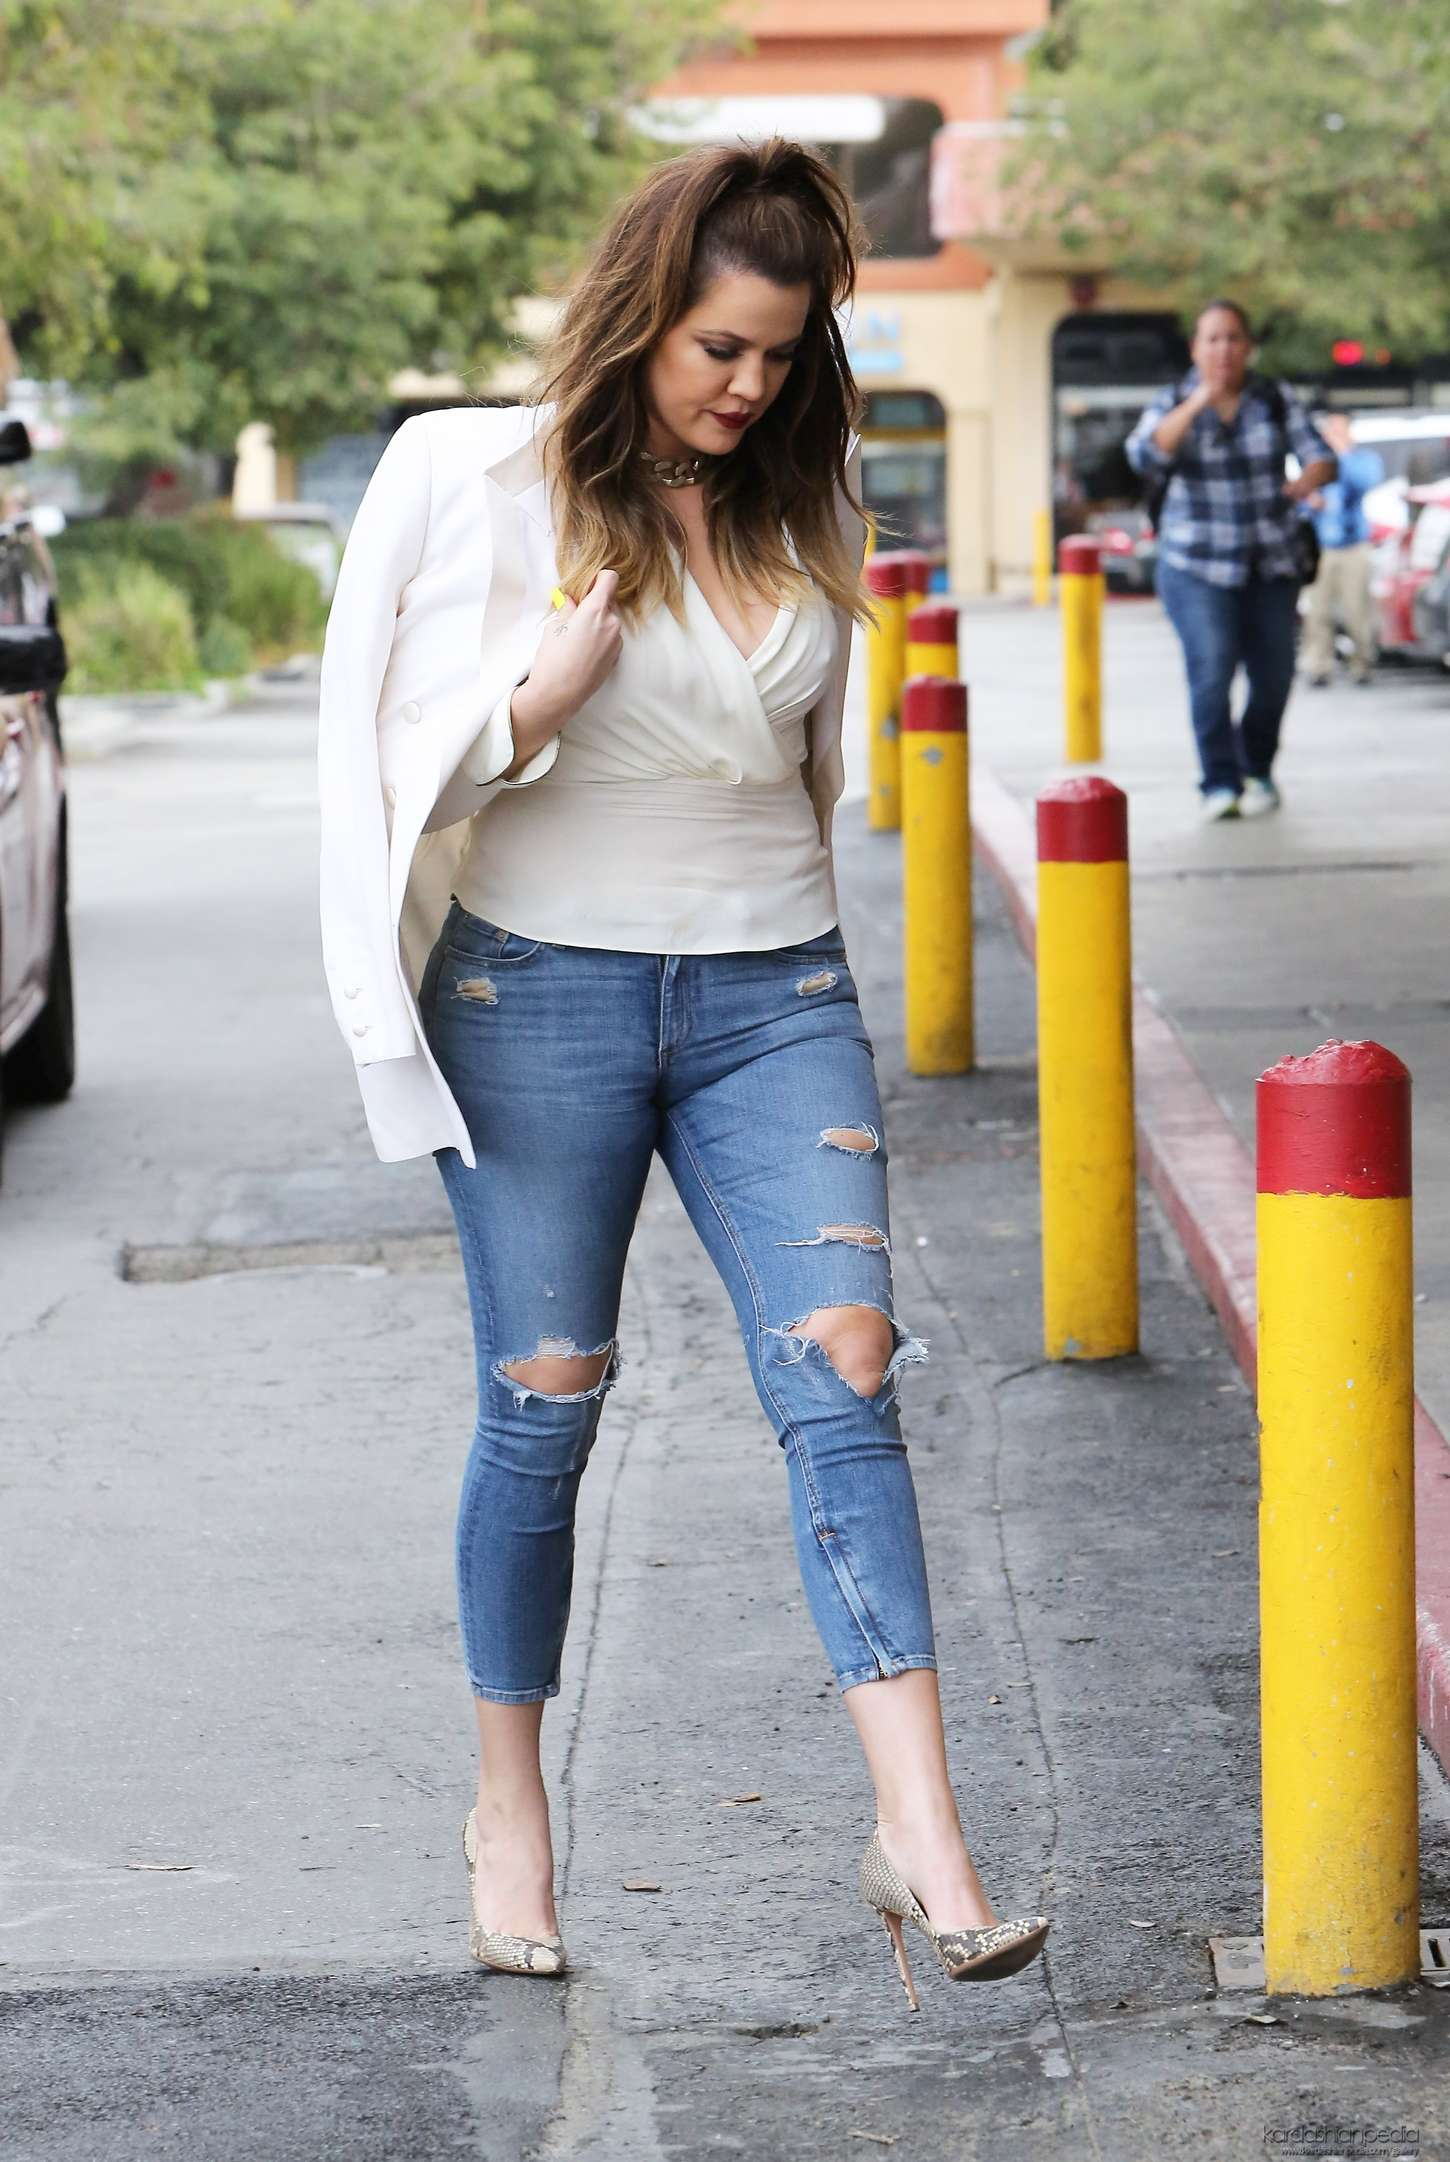 Khloe Kardashian in Tight Ripped Jeans -03 - GotCeleb